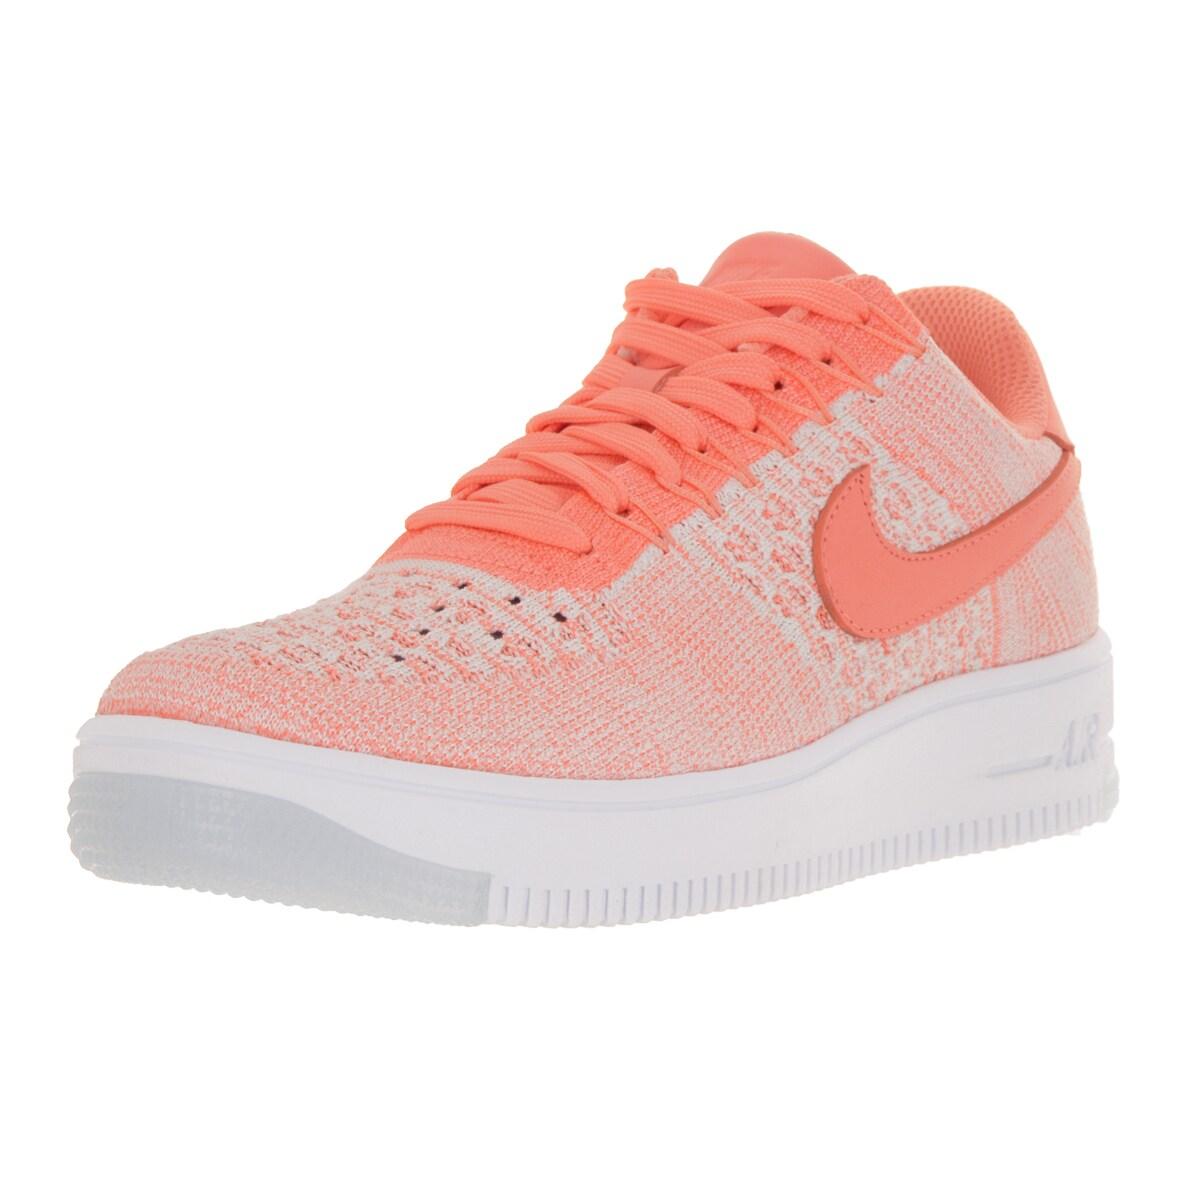 Nike Women's AF1 Flyknit Low Atomic Pink Casual Shoe (7),...